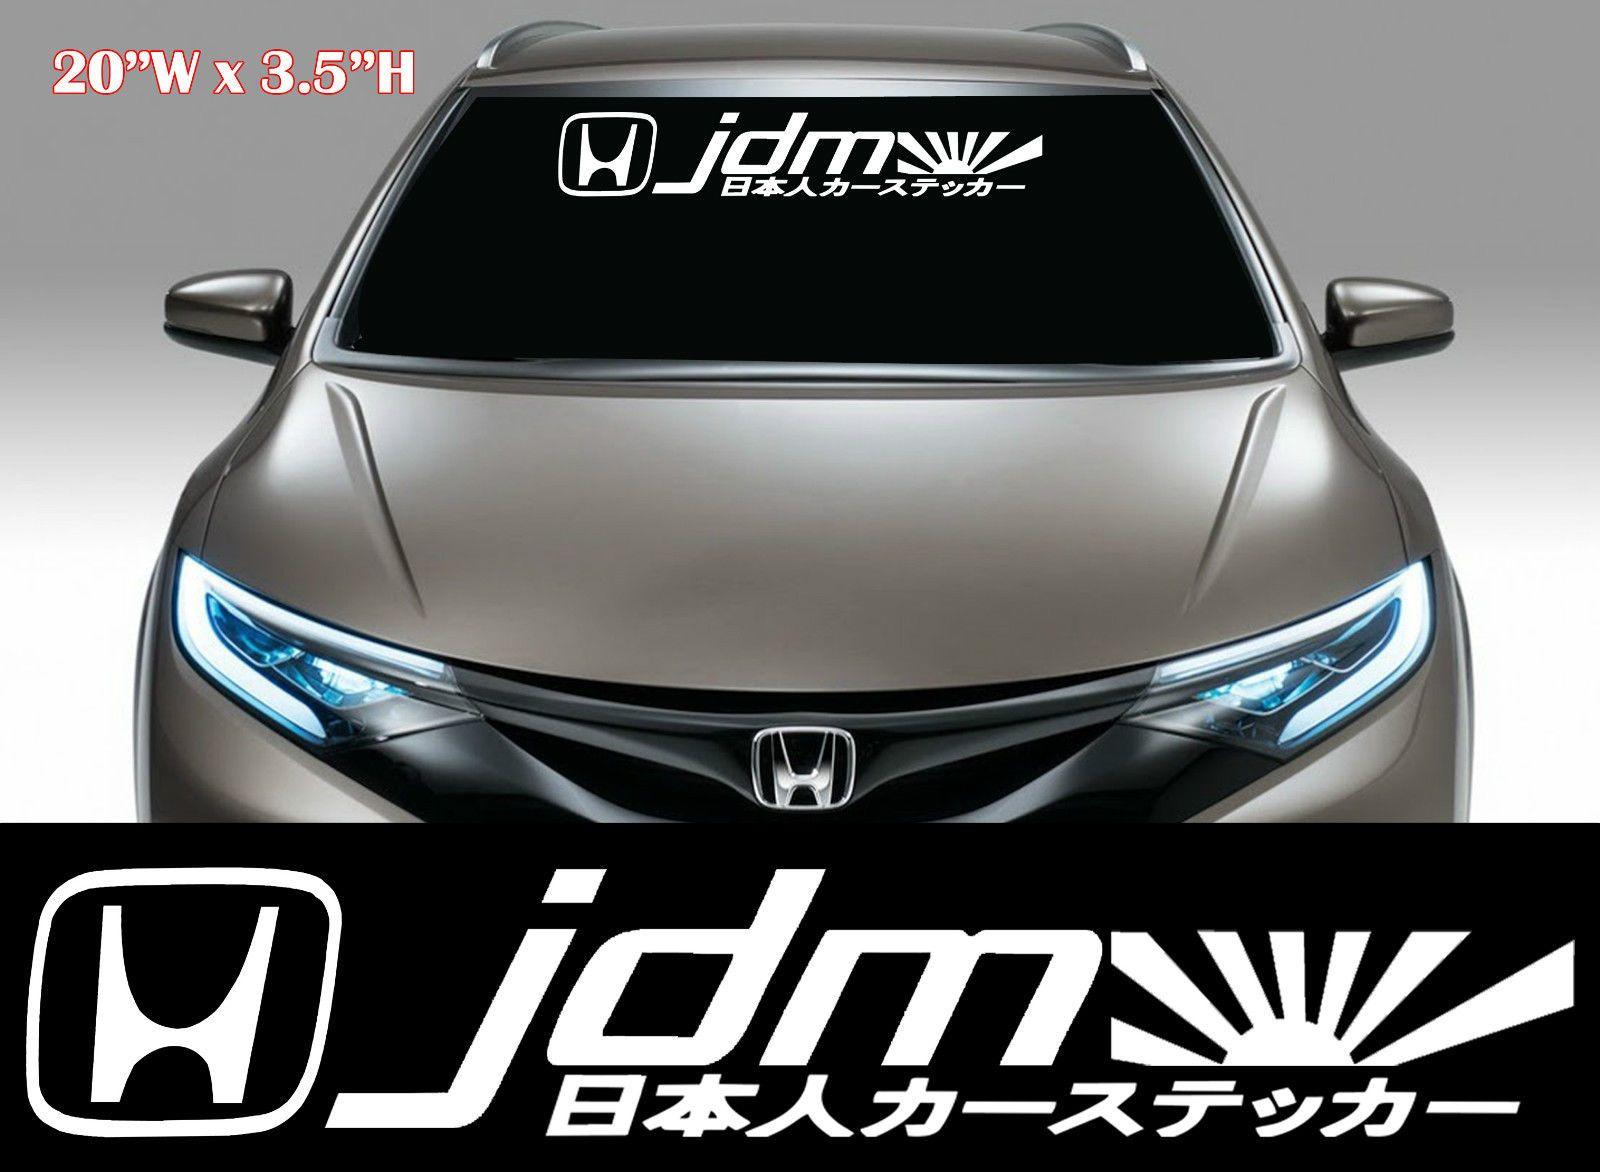 Honda fit car sticker design - 1x Jdm Kanji Racing Decal Sticker Mugen Windshield Decal Fits Honda 104 Ebay